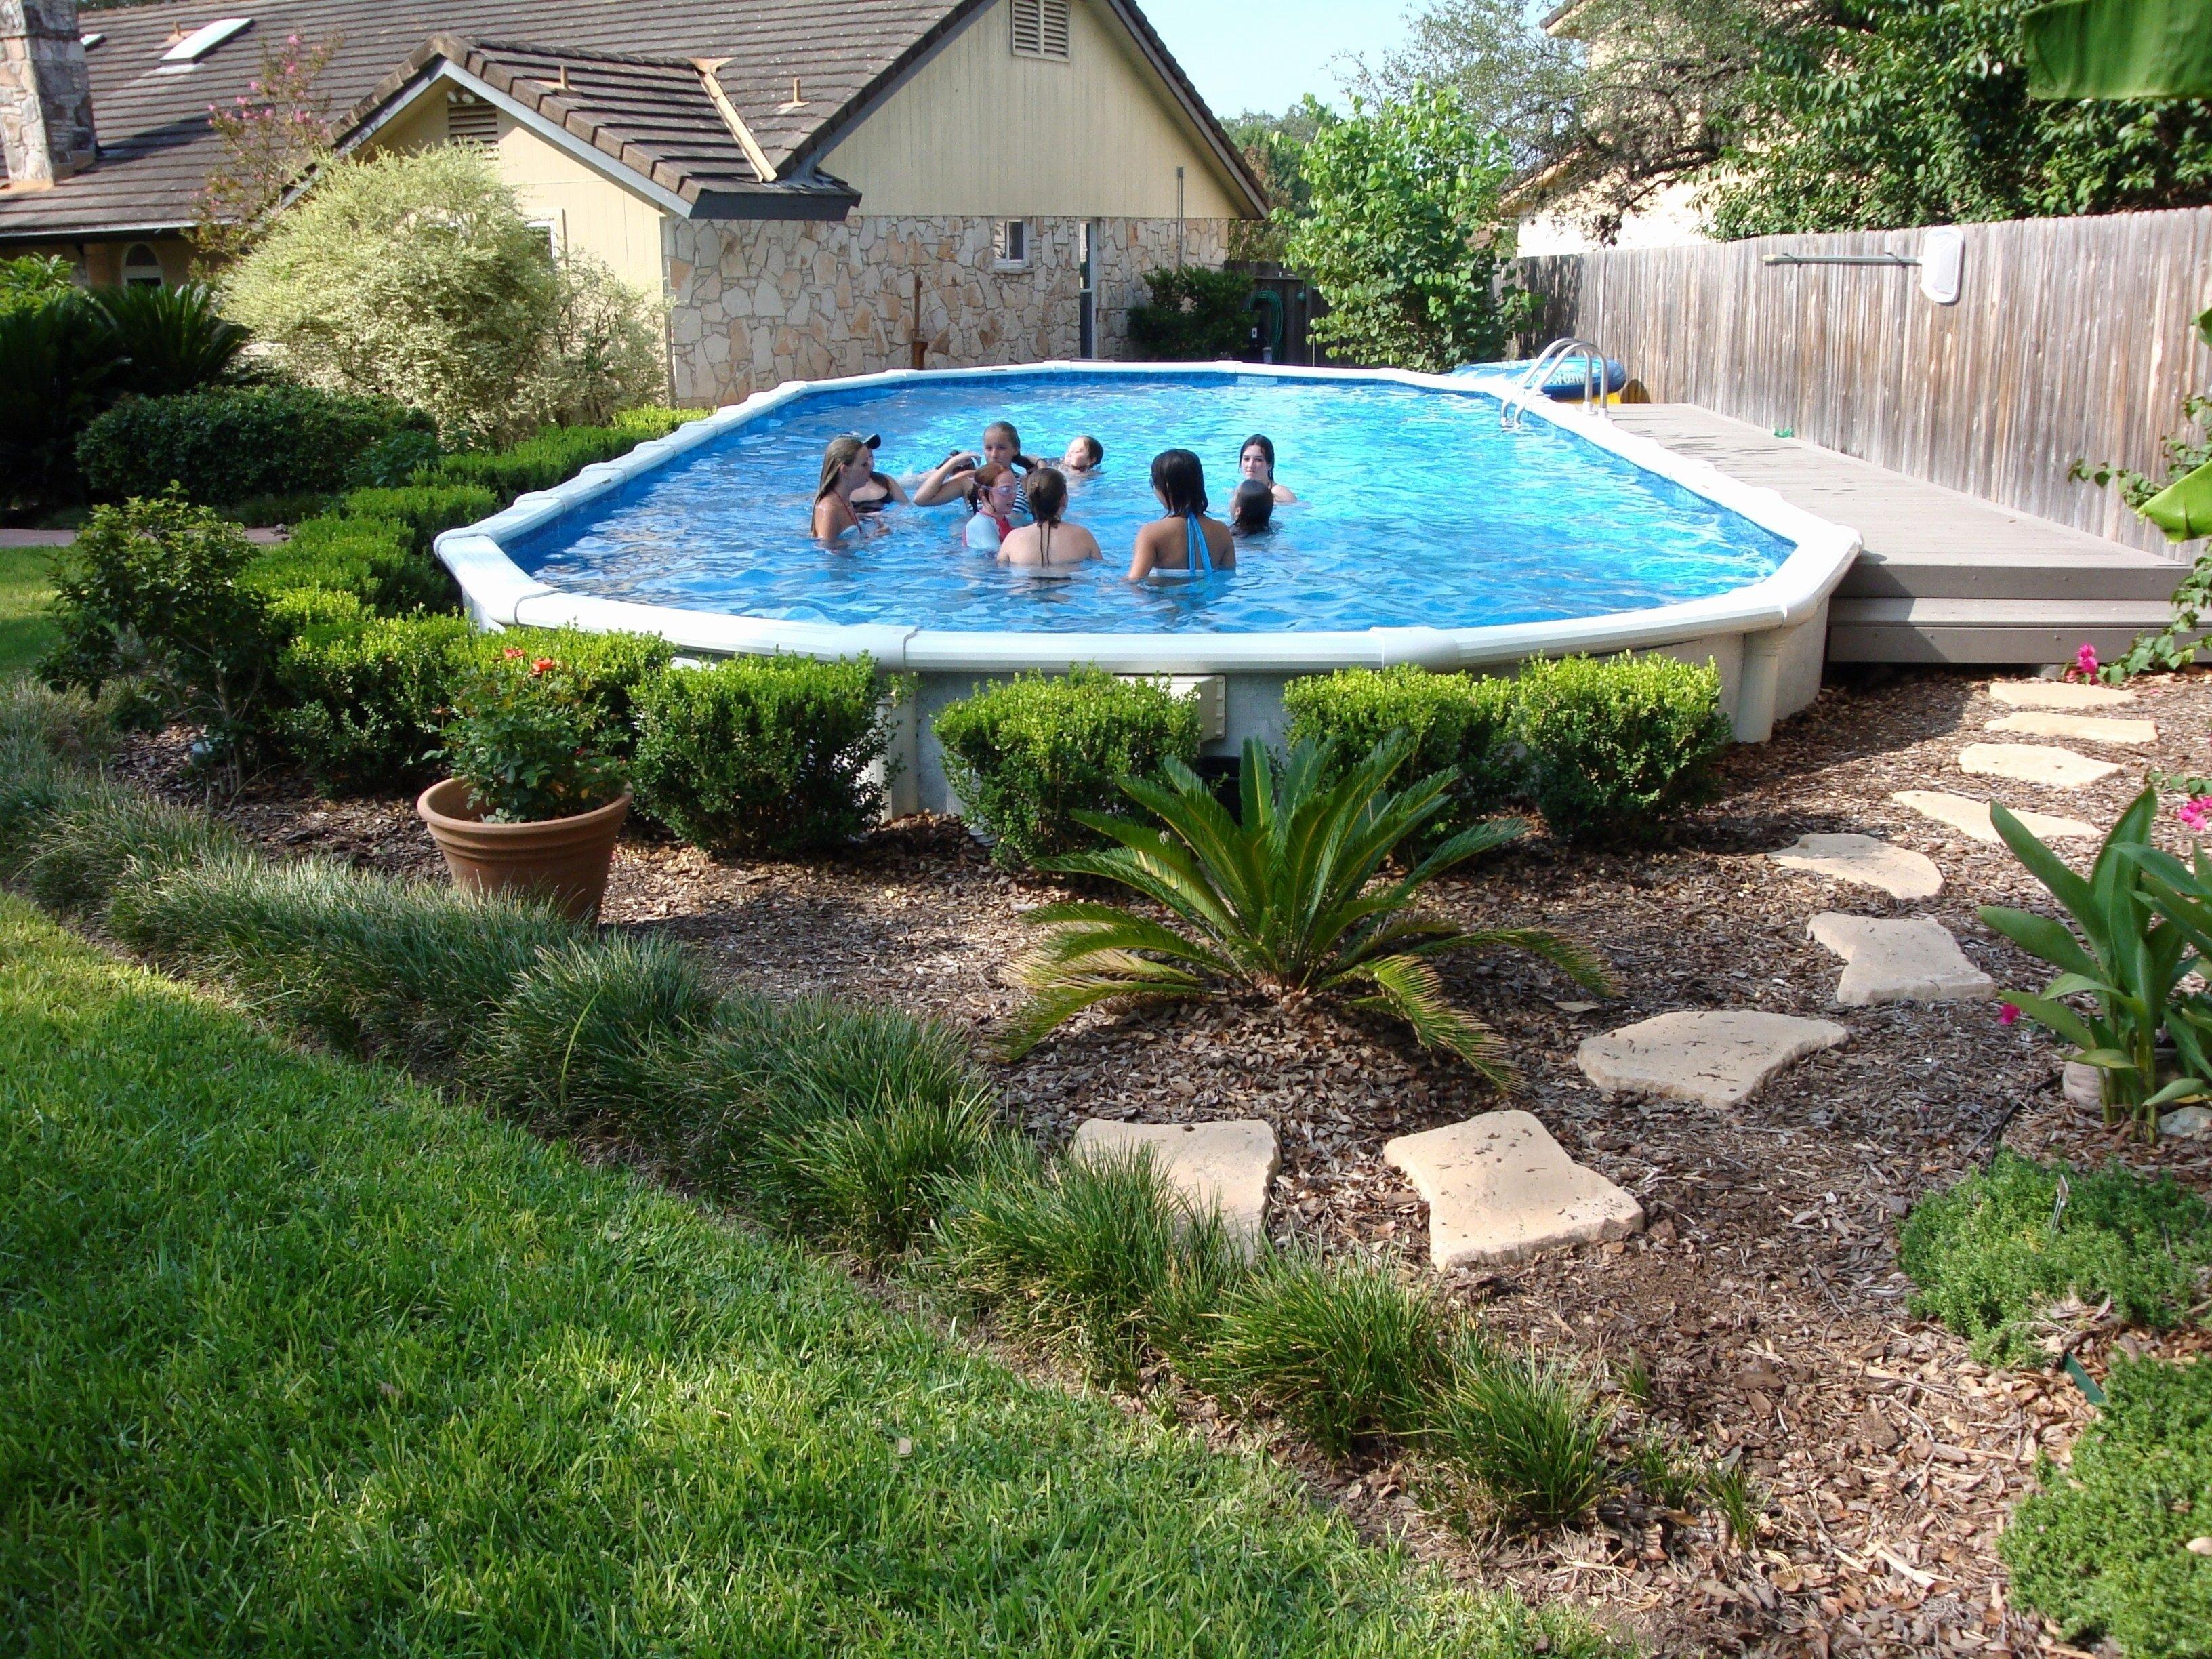 10 Stylish Above Ground Pool Landscape Ideas picture 3 of 50 above ground pool landscaping ideas new nice above 2020